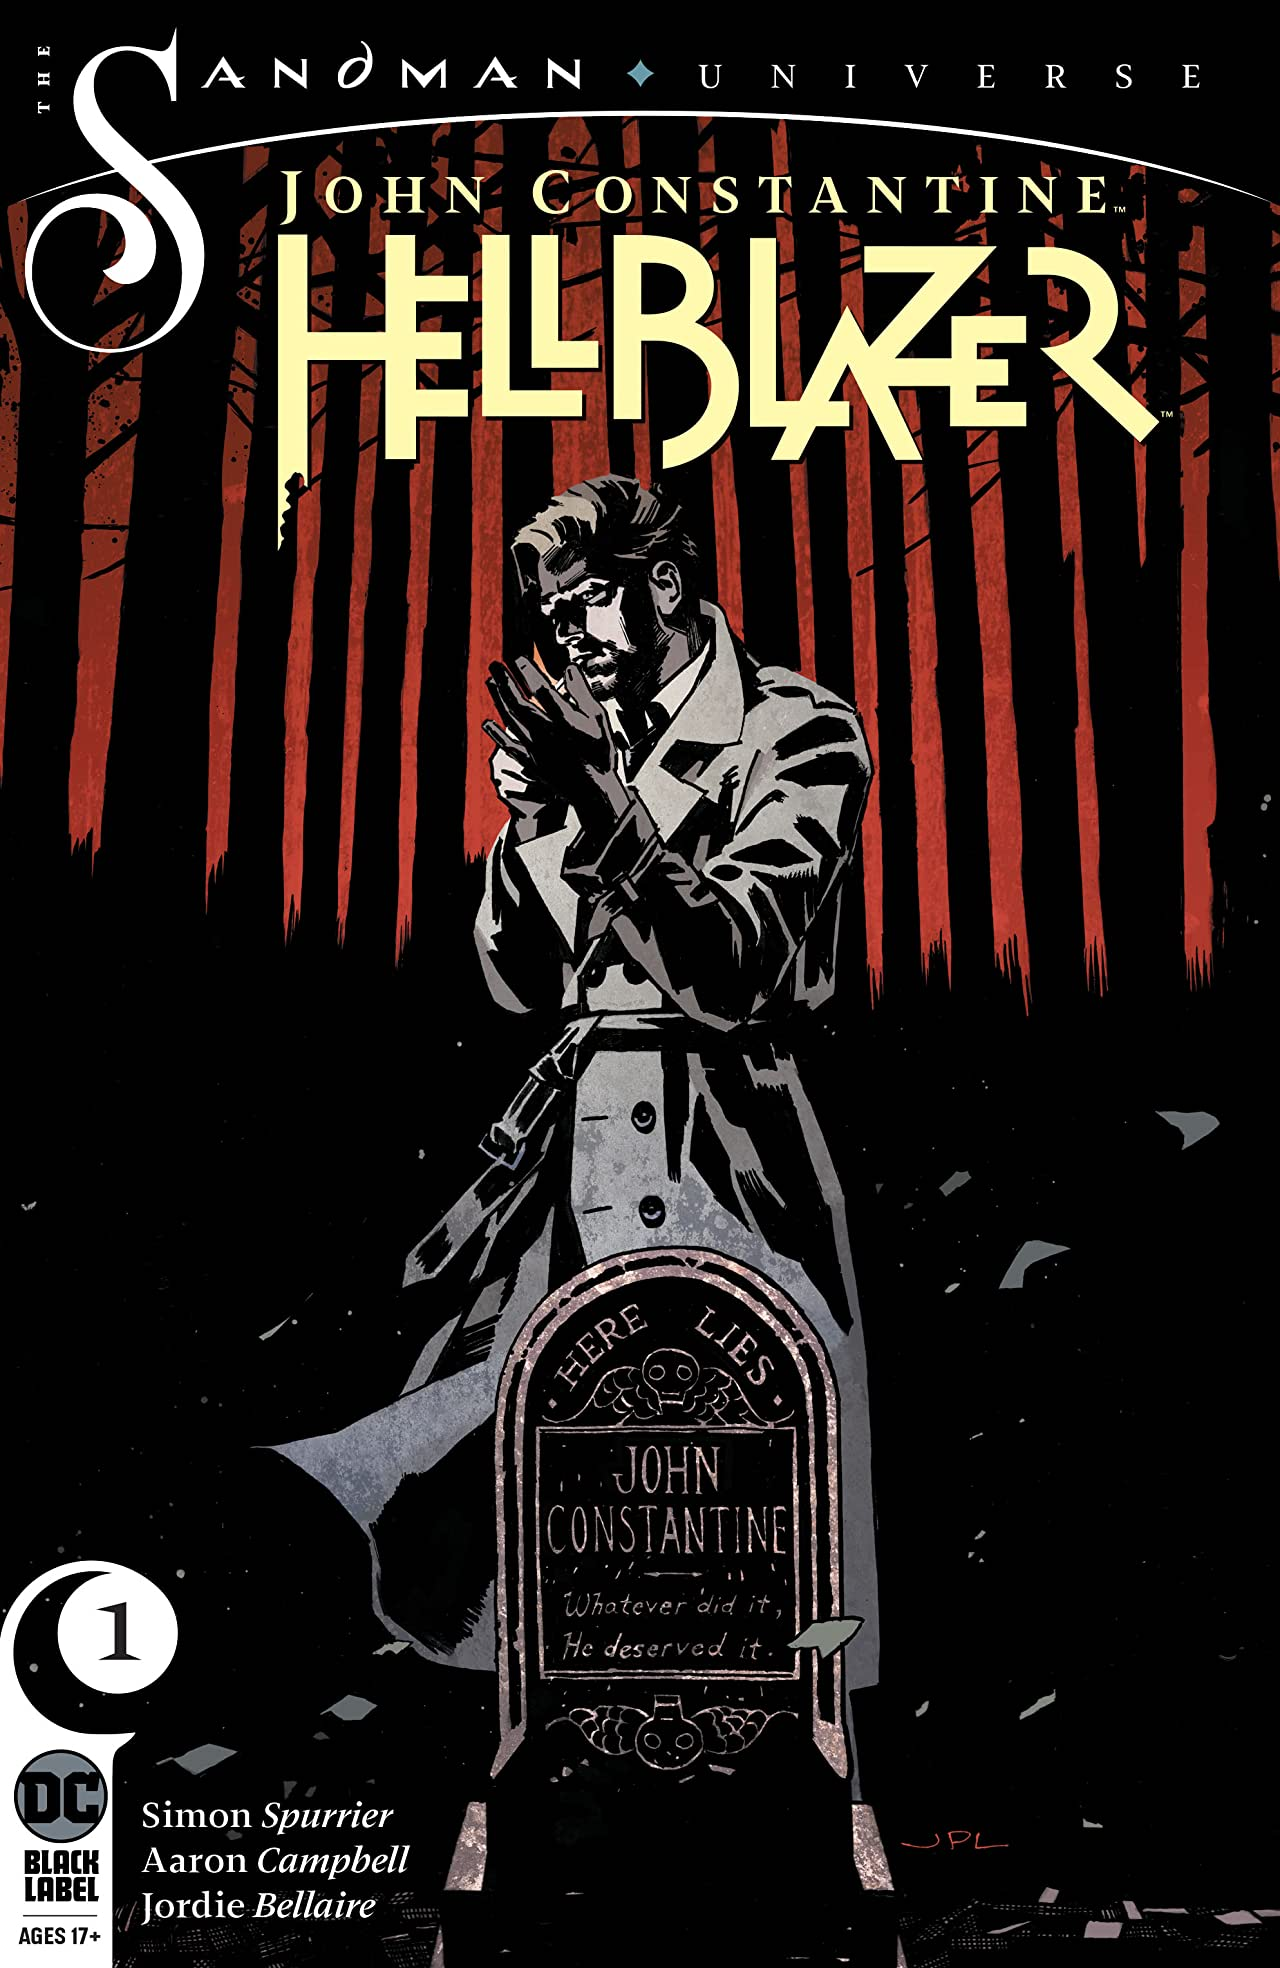 #3 John Constantine: Hellblazer